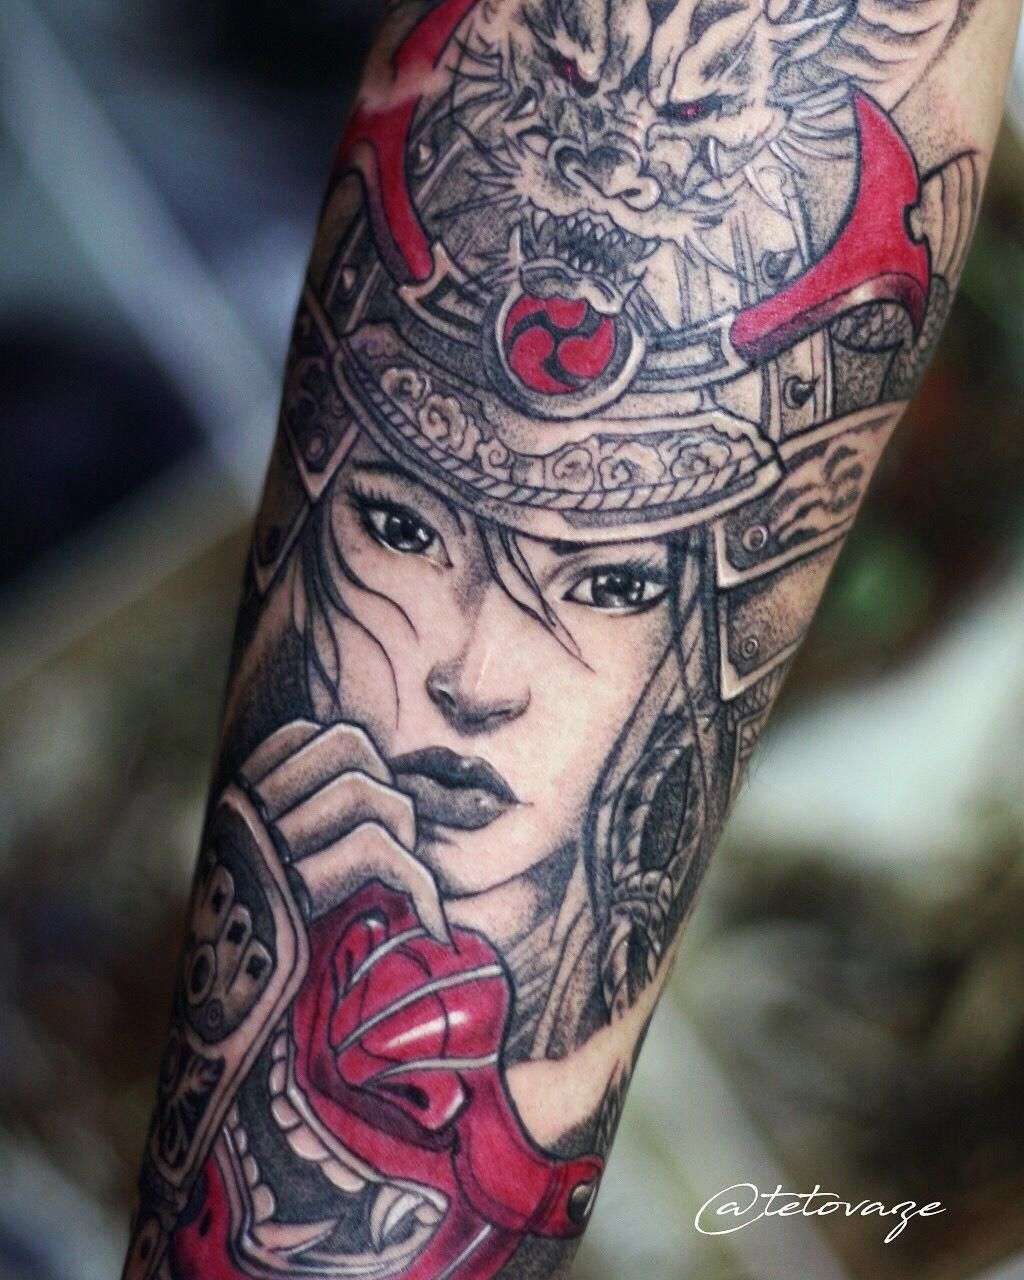 3d28979e3 Samurai tattoo Men tattoo Sleeve tattoo Samurai girl Tattoo design Unik  @tetovaze #Tattoosformen